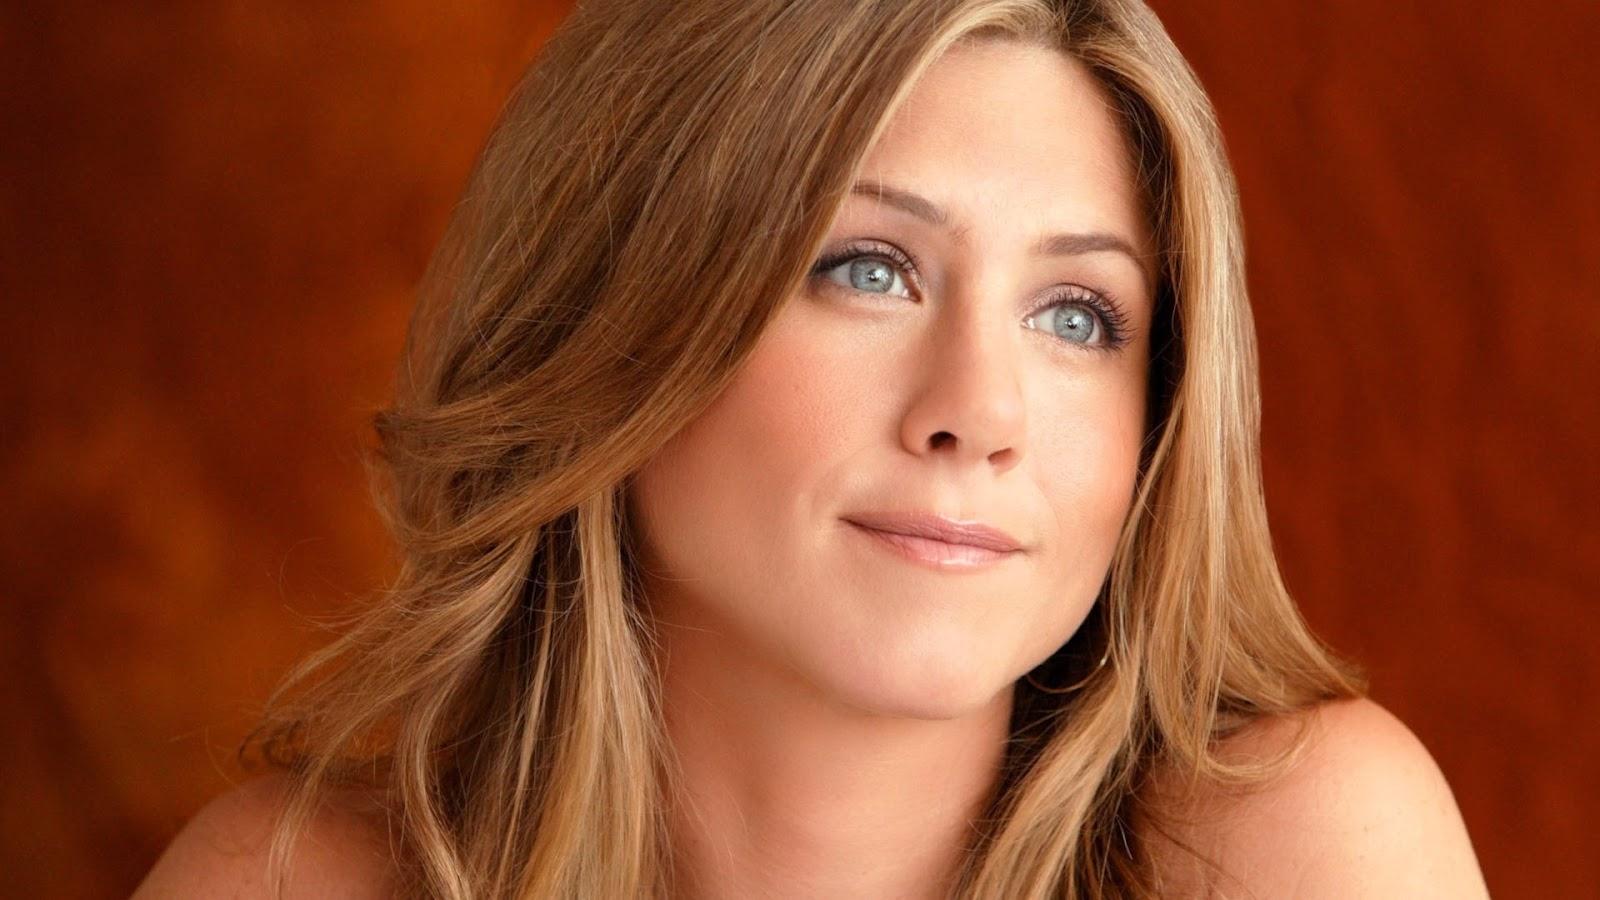 Hollywood Actress Jennifer Aniston Wallpapers HD ~ Desktop